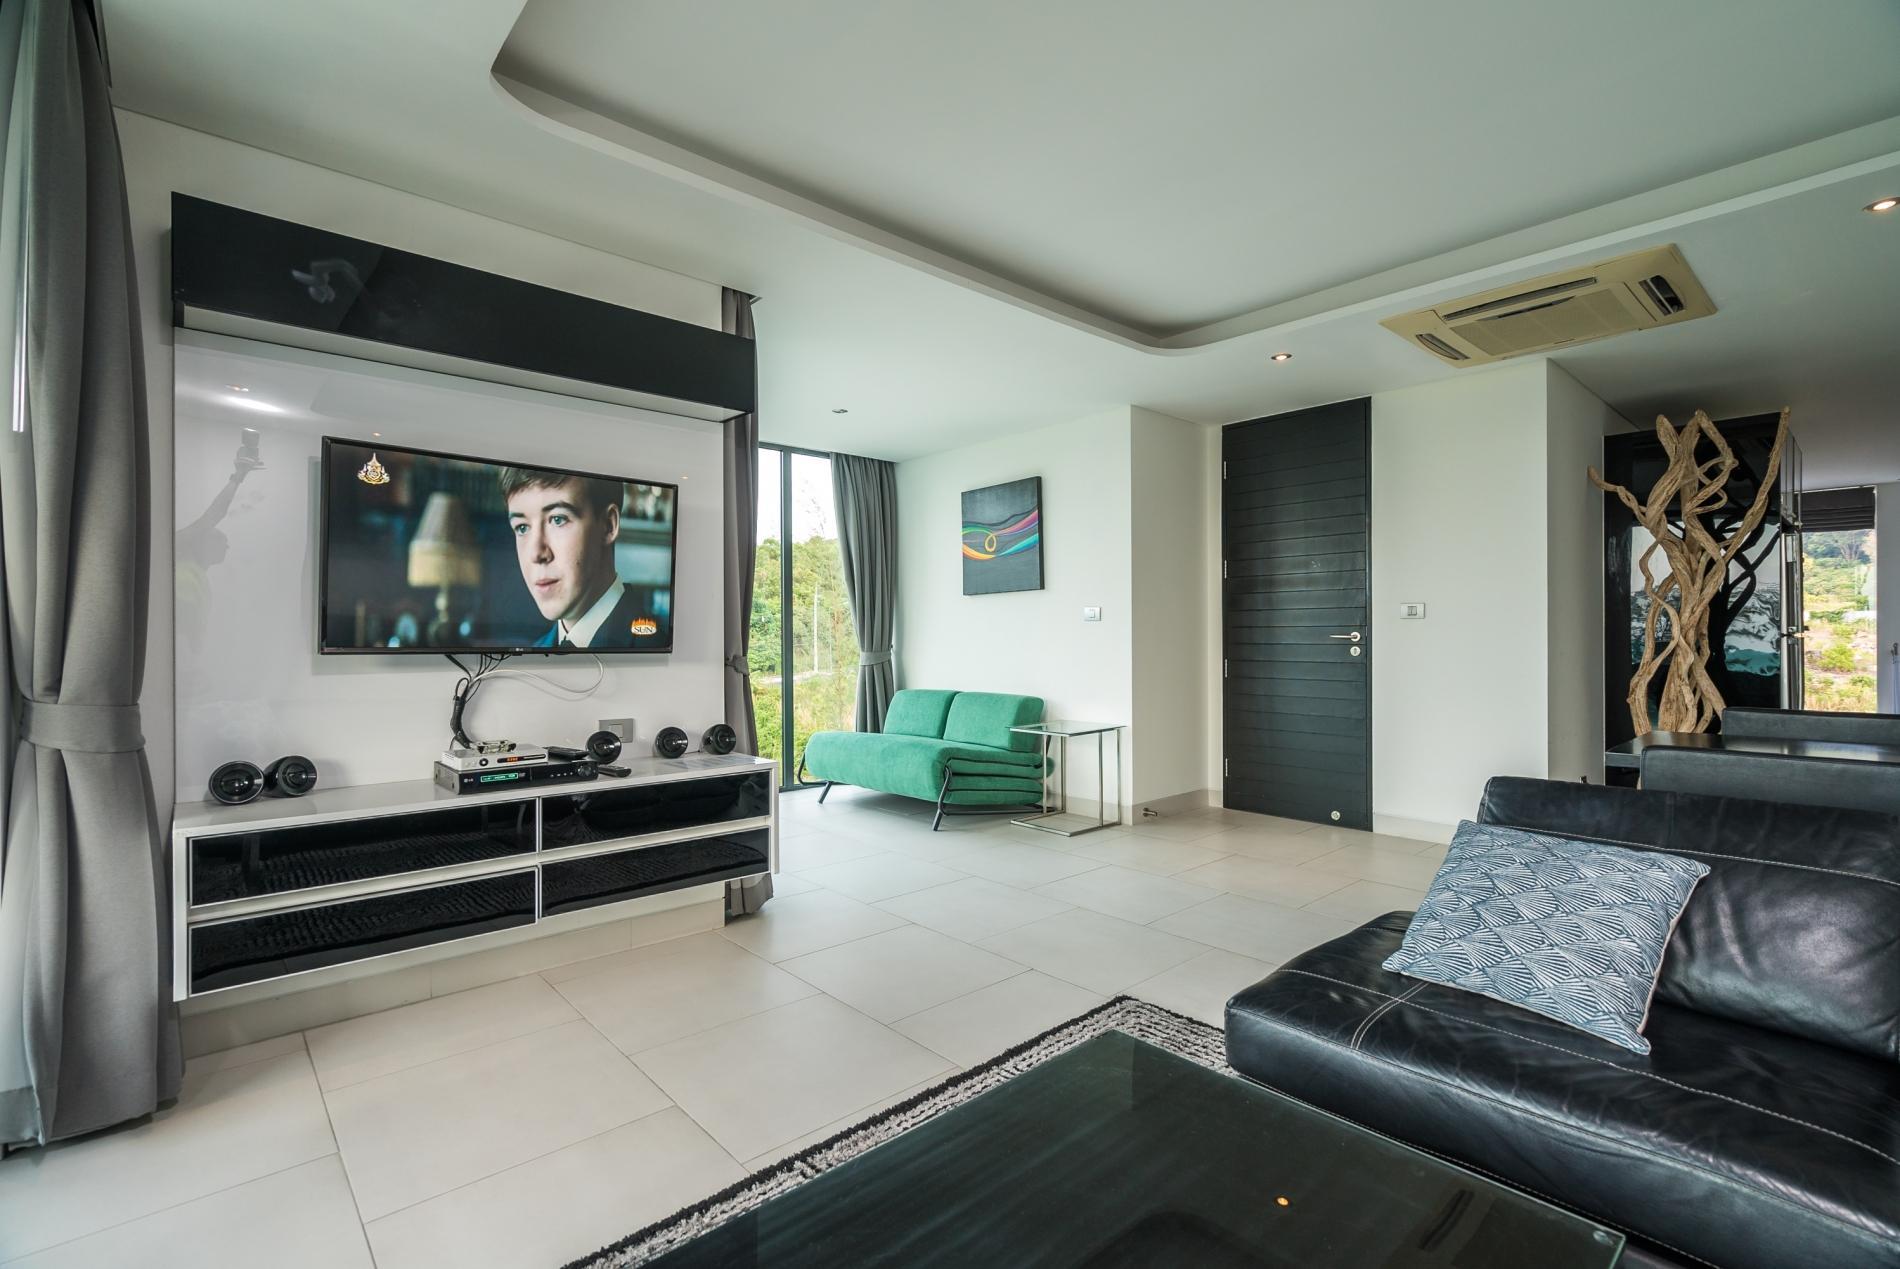 Apartment Twin Sands 1406 - Panoramic seaview apartment walk to beach  shared pool photo 17053728